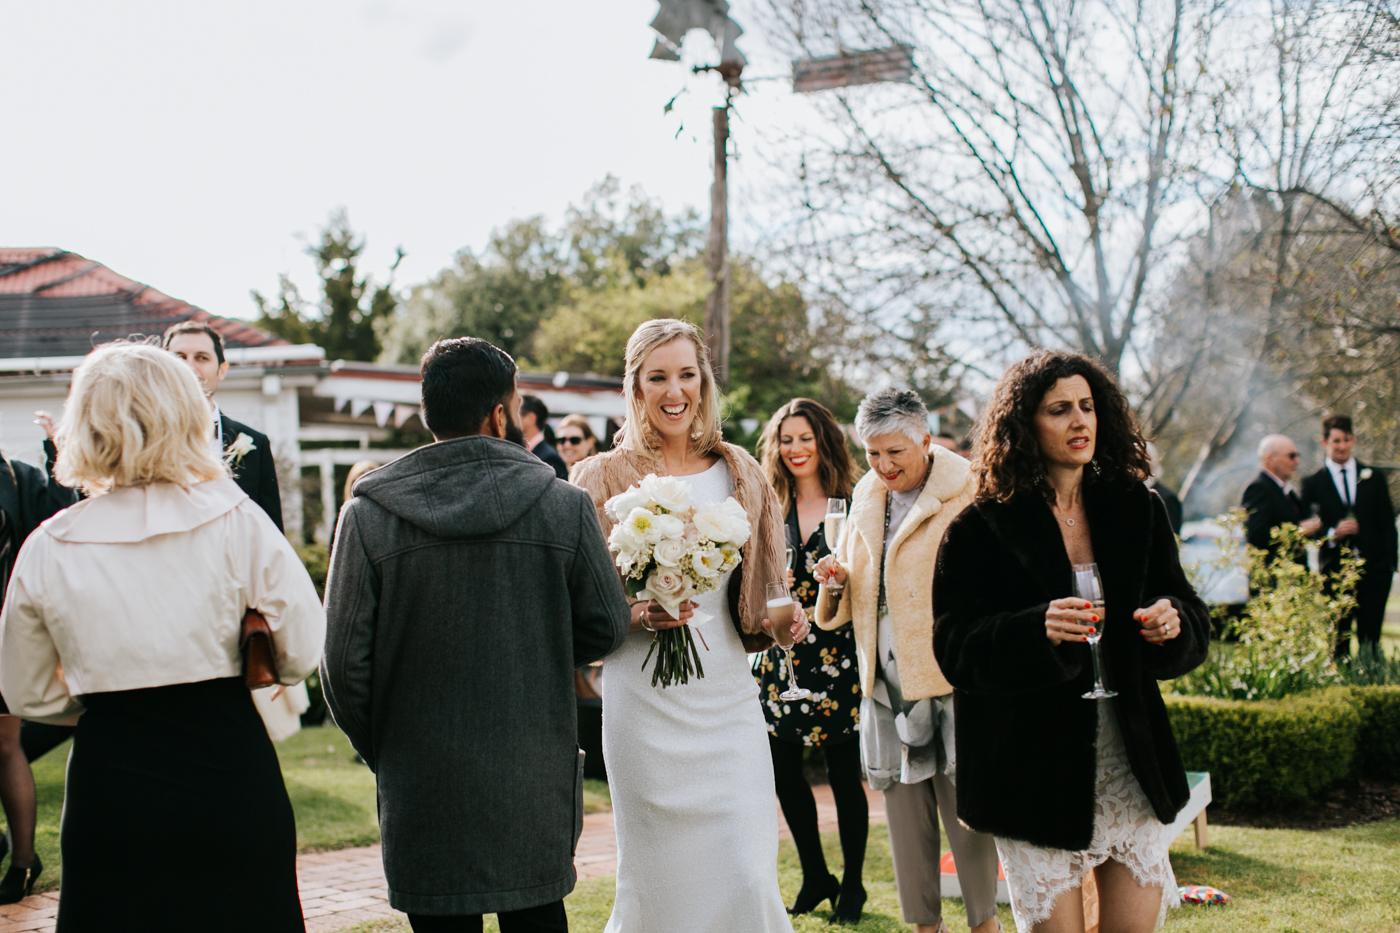 Bridget & James - Orange Country Wedding - Samantha Heather Photography-71.jpg